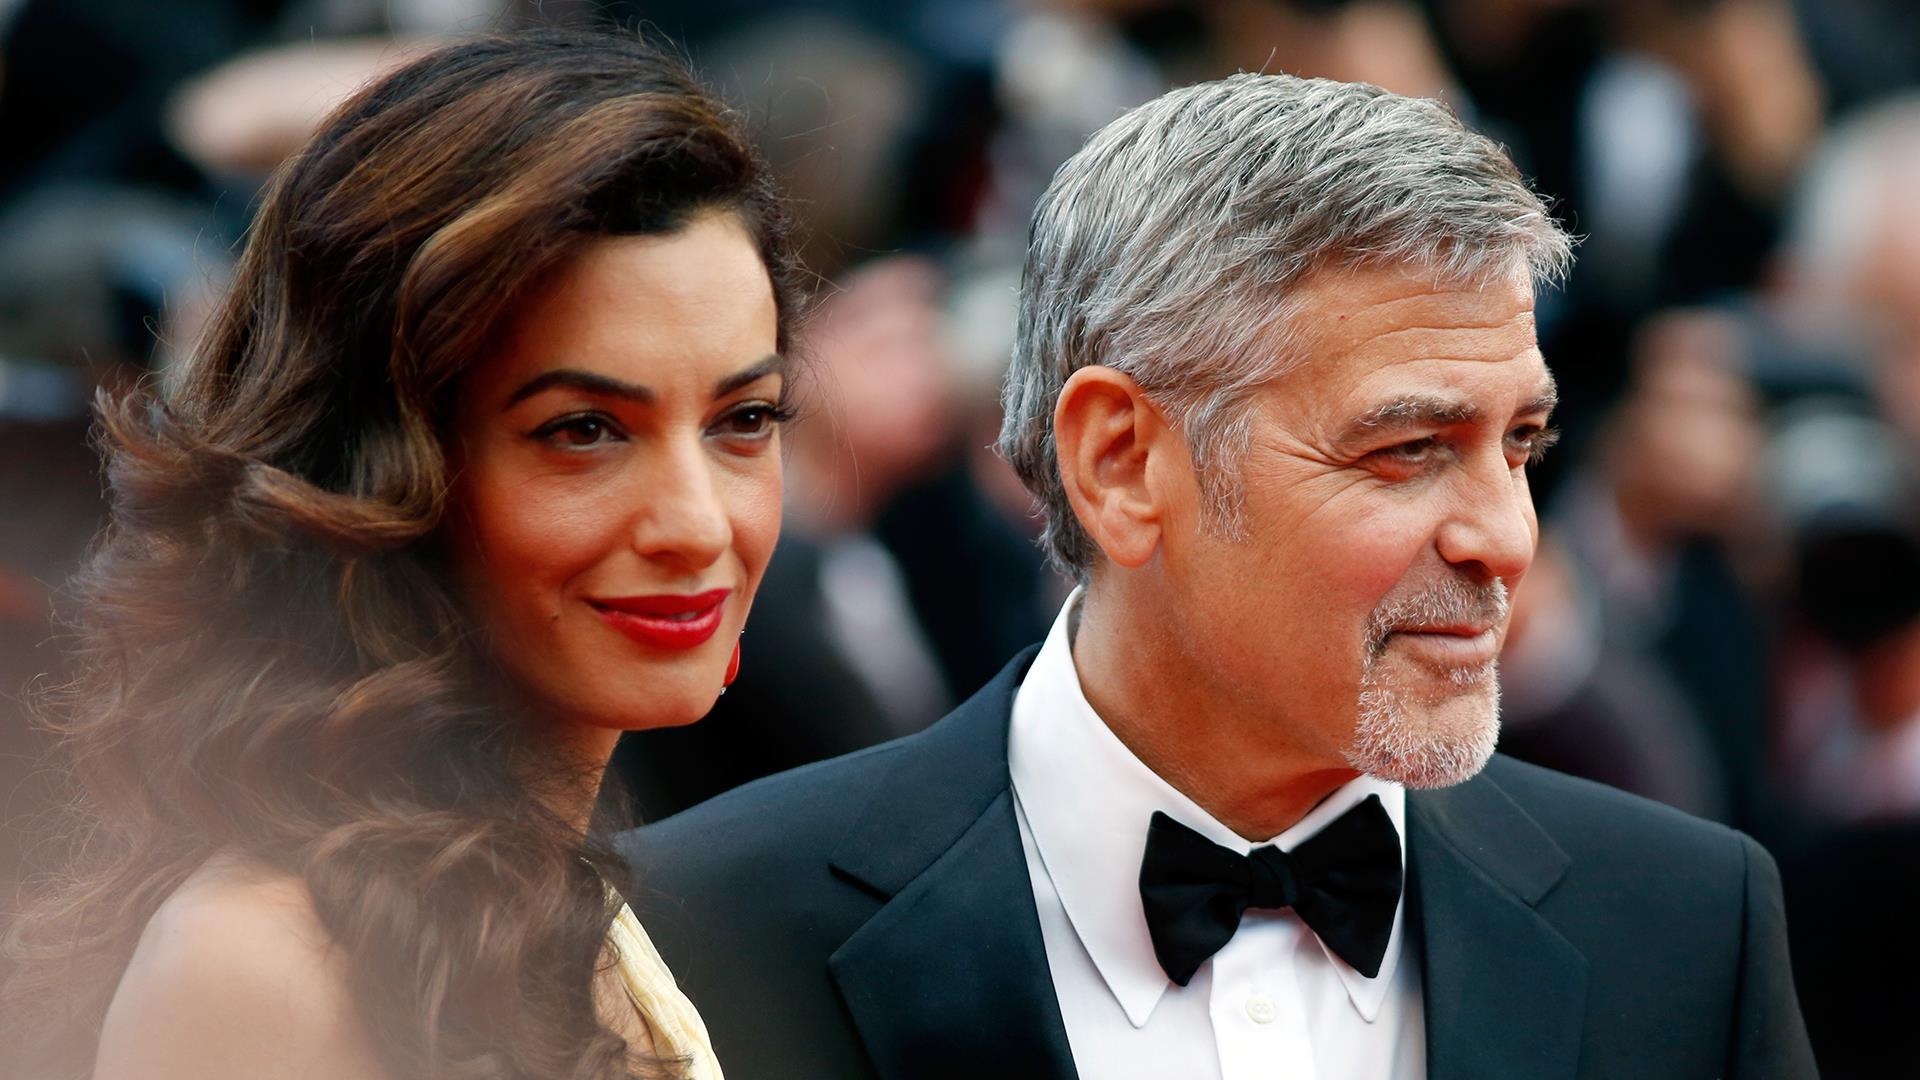 Matt Damon reveals his reaction when George Clooney said he was